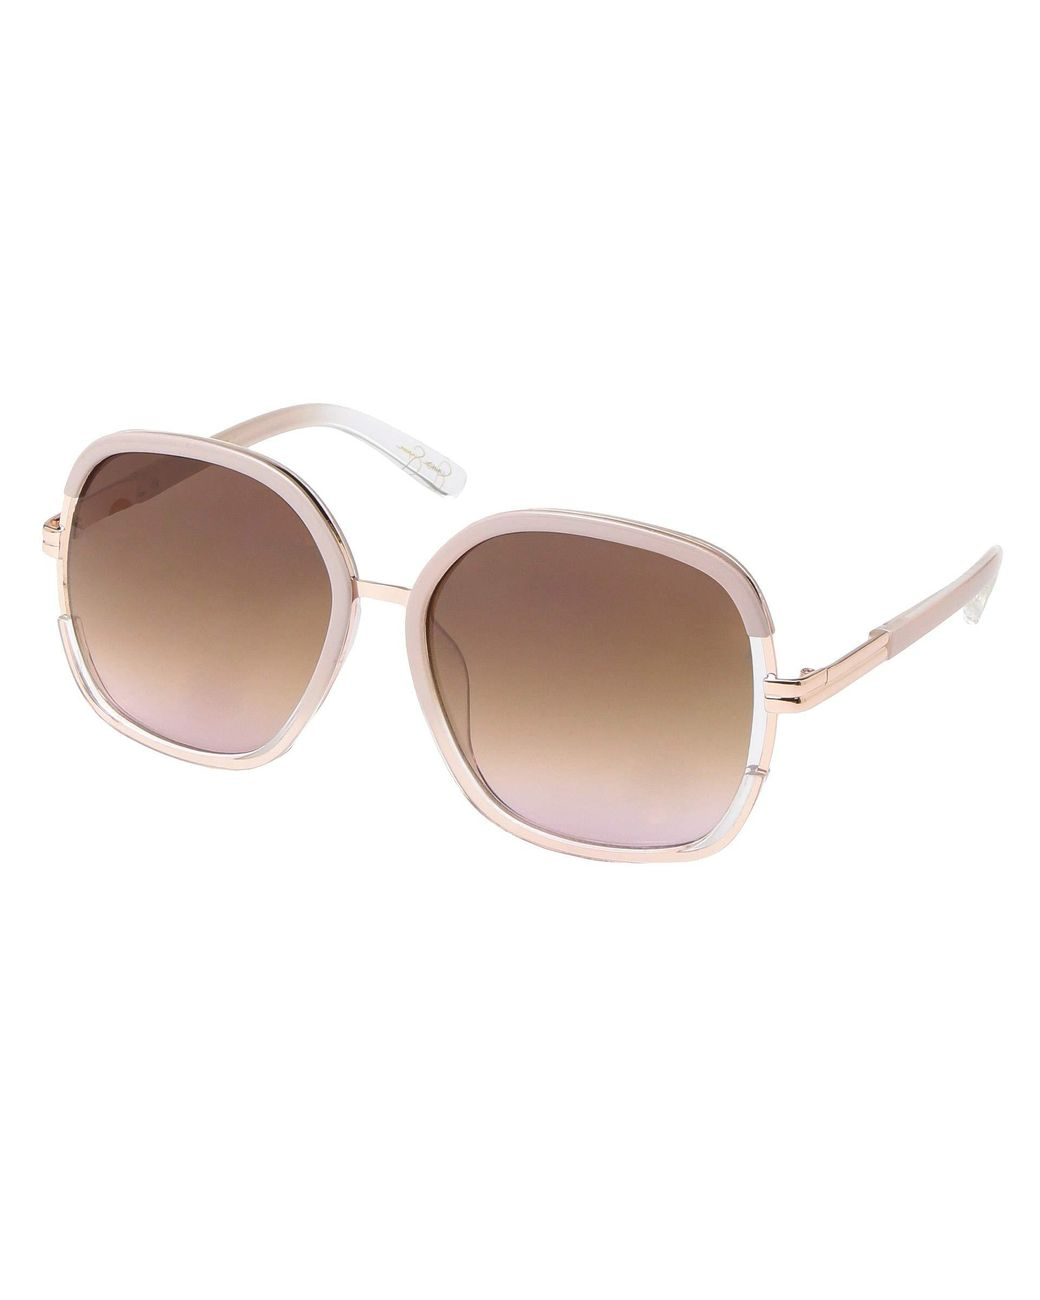 Jessica Simpson J5686 Black Brown Women/'s Sunglasses NWT